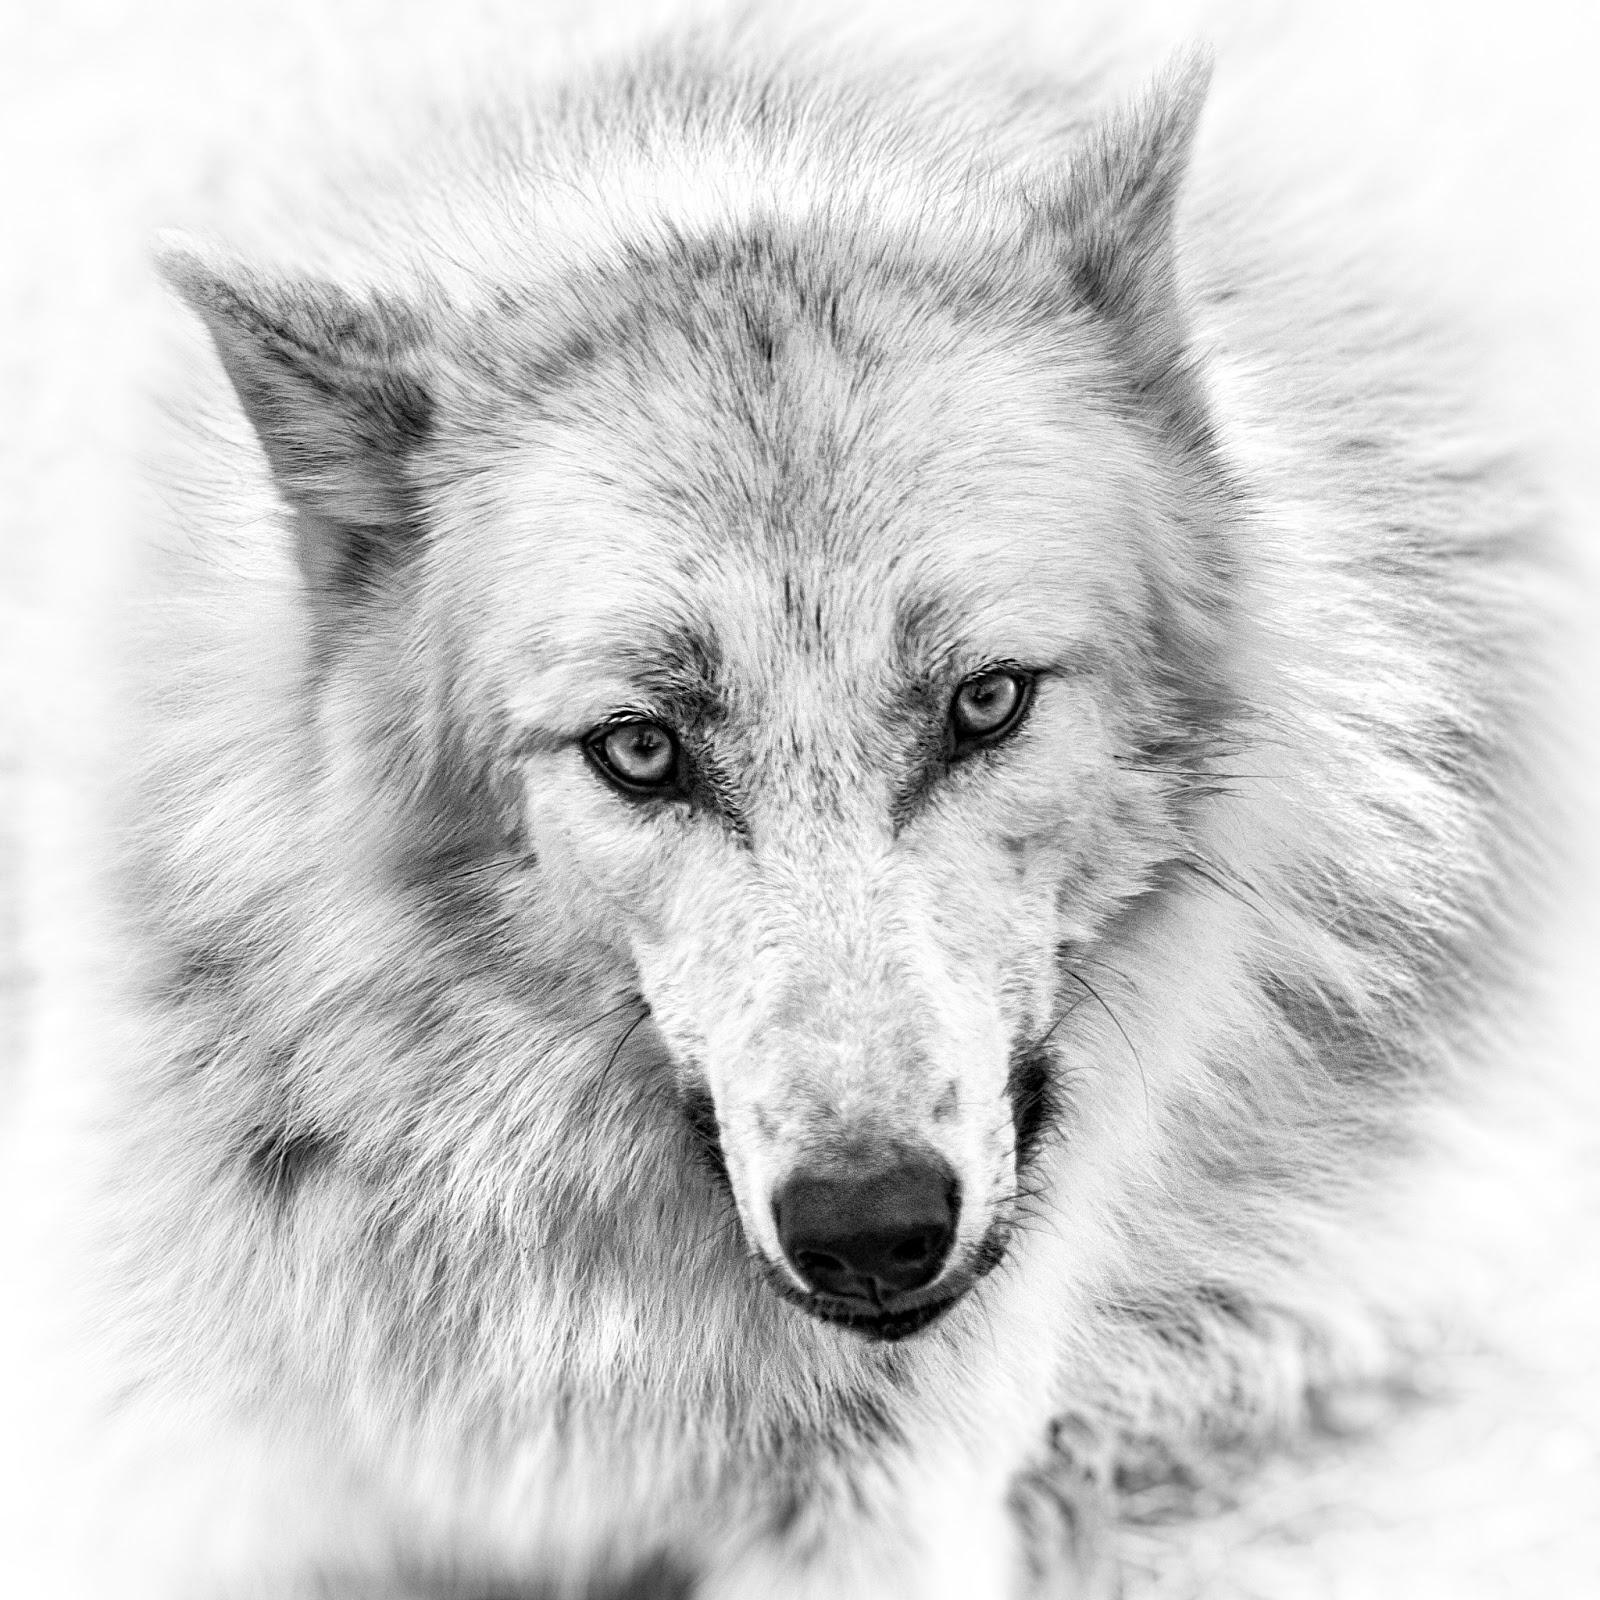 Wolf Stare Breakdown